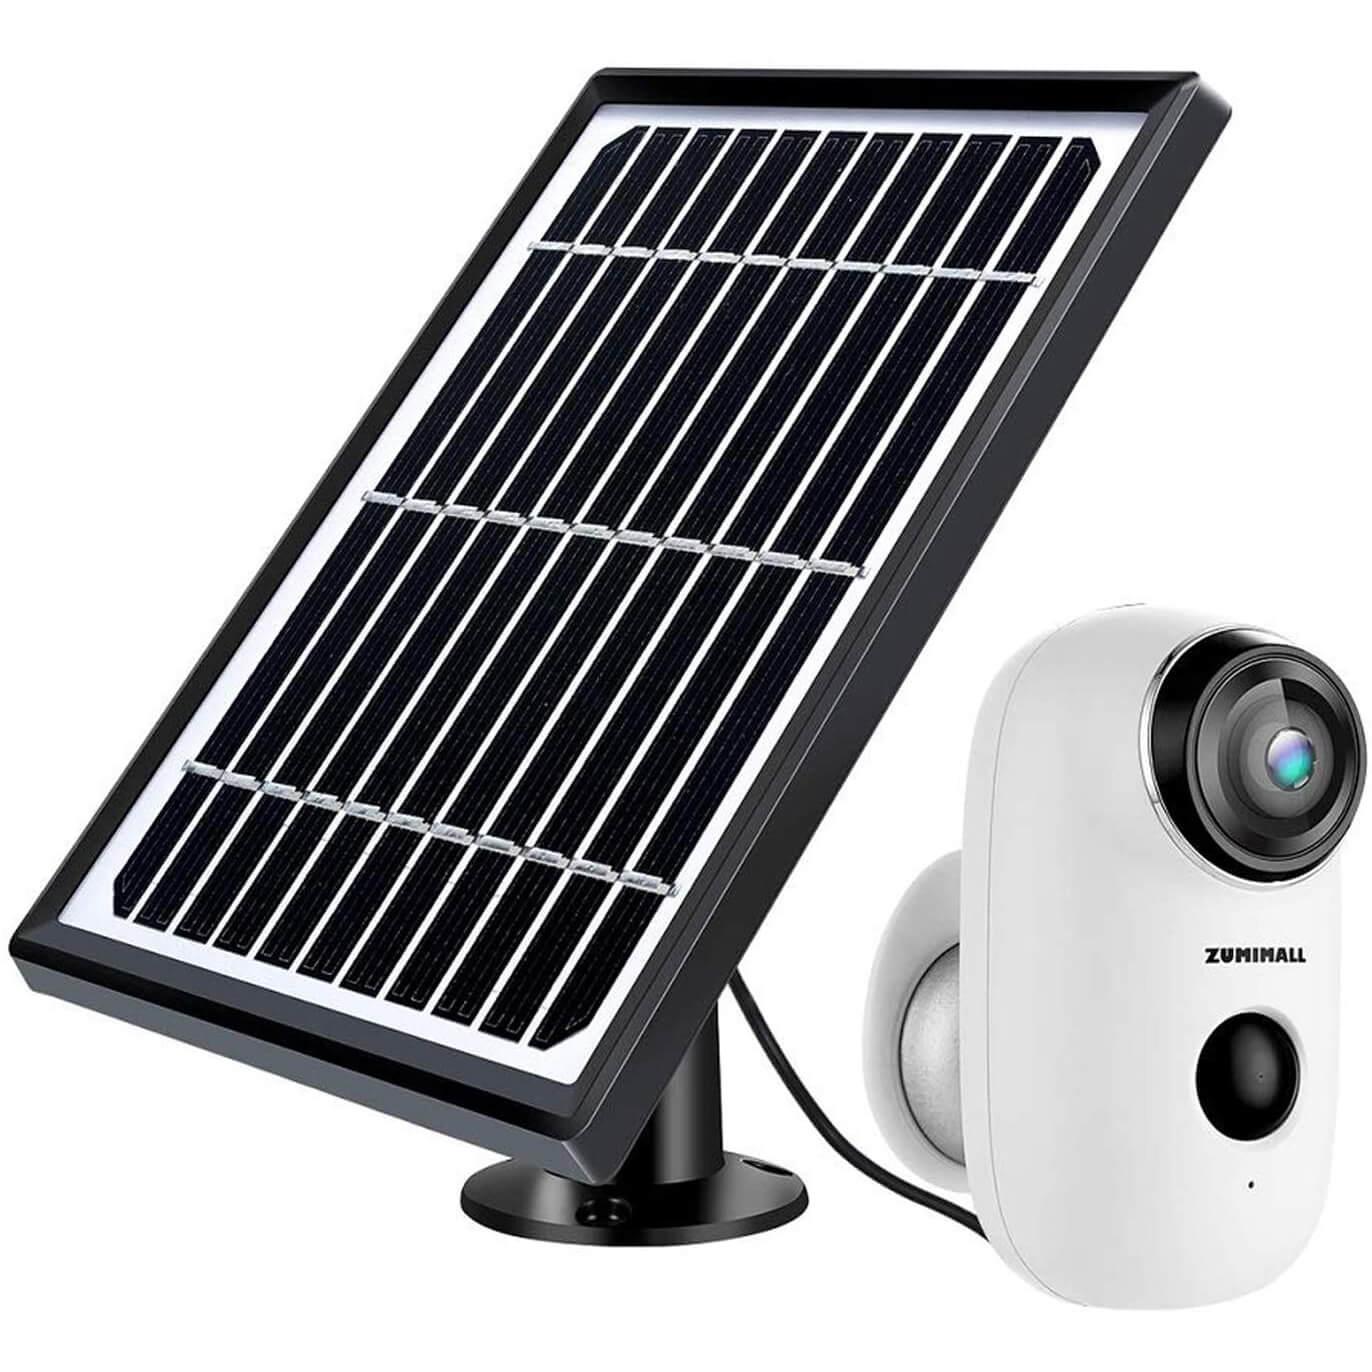 ZUMIMALL Solar Powered Surveillance Camera